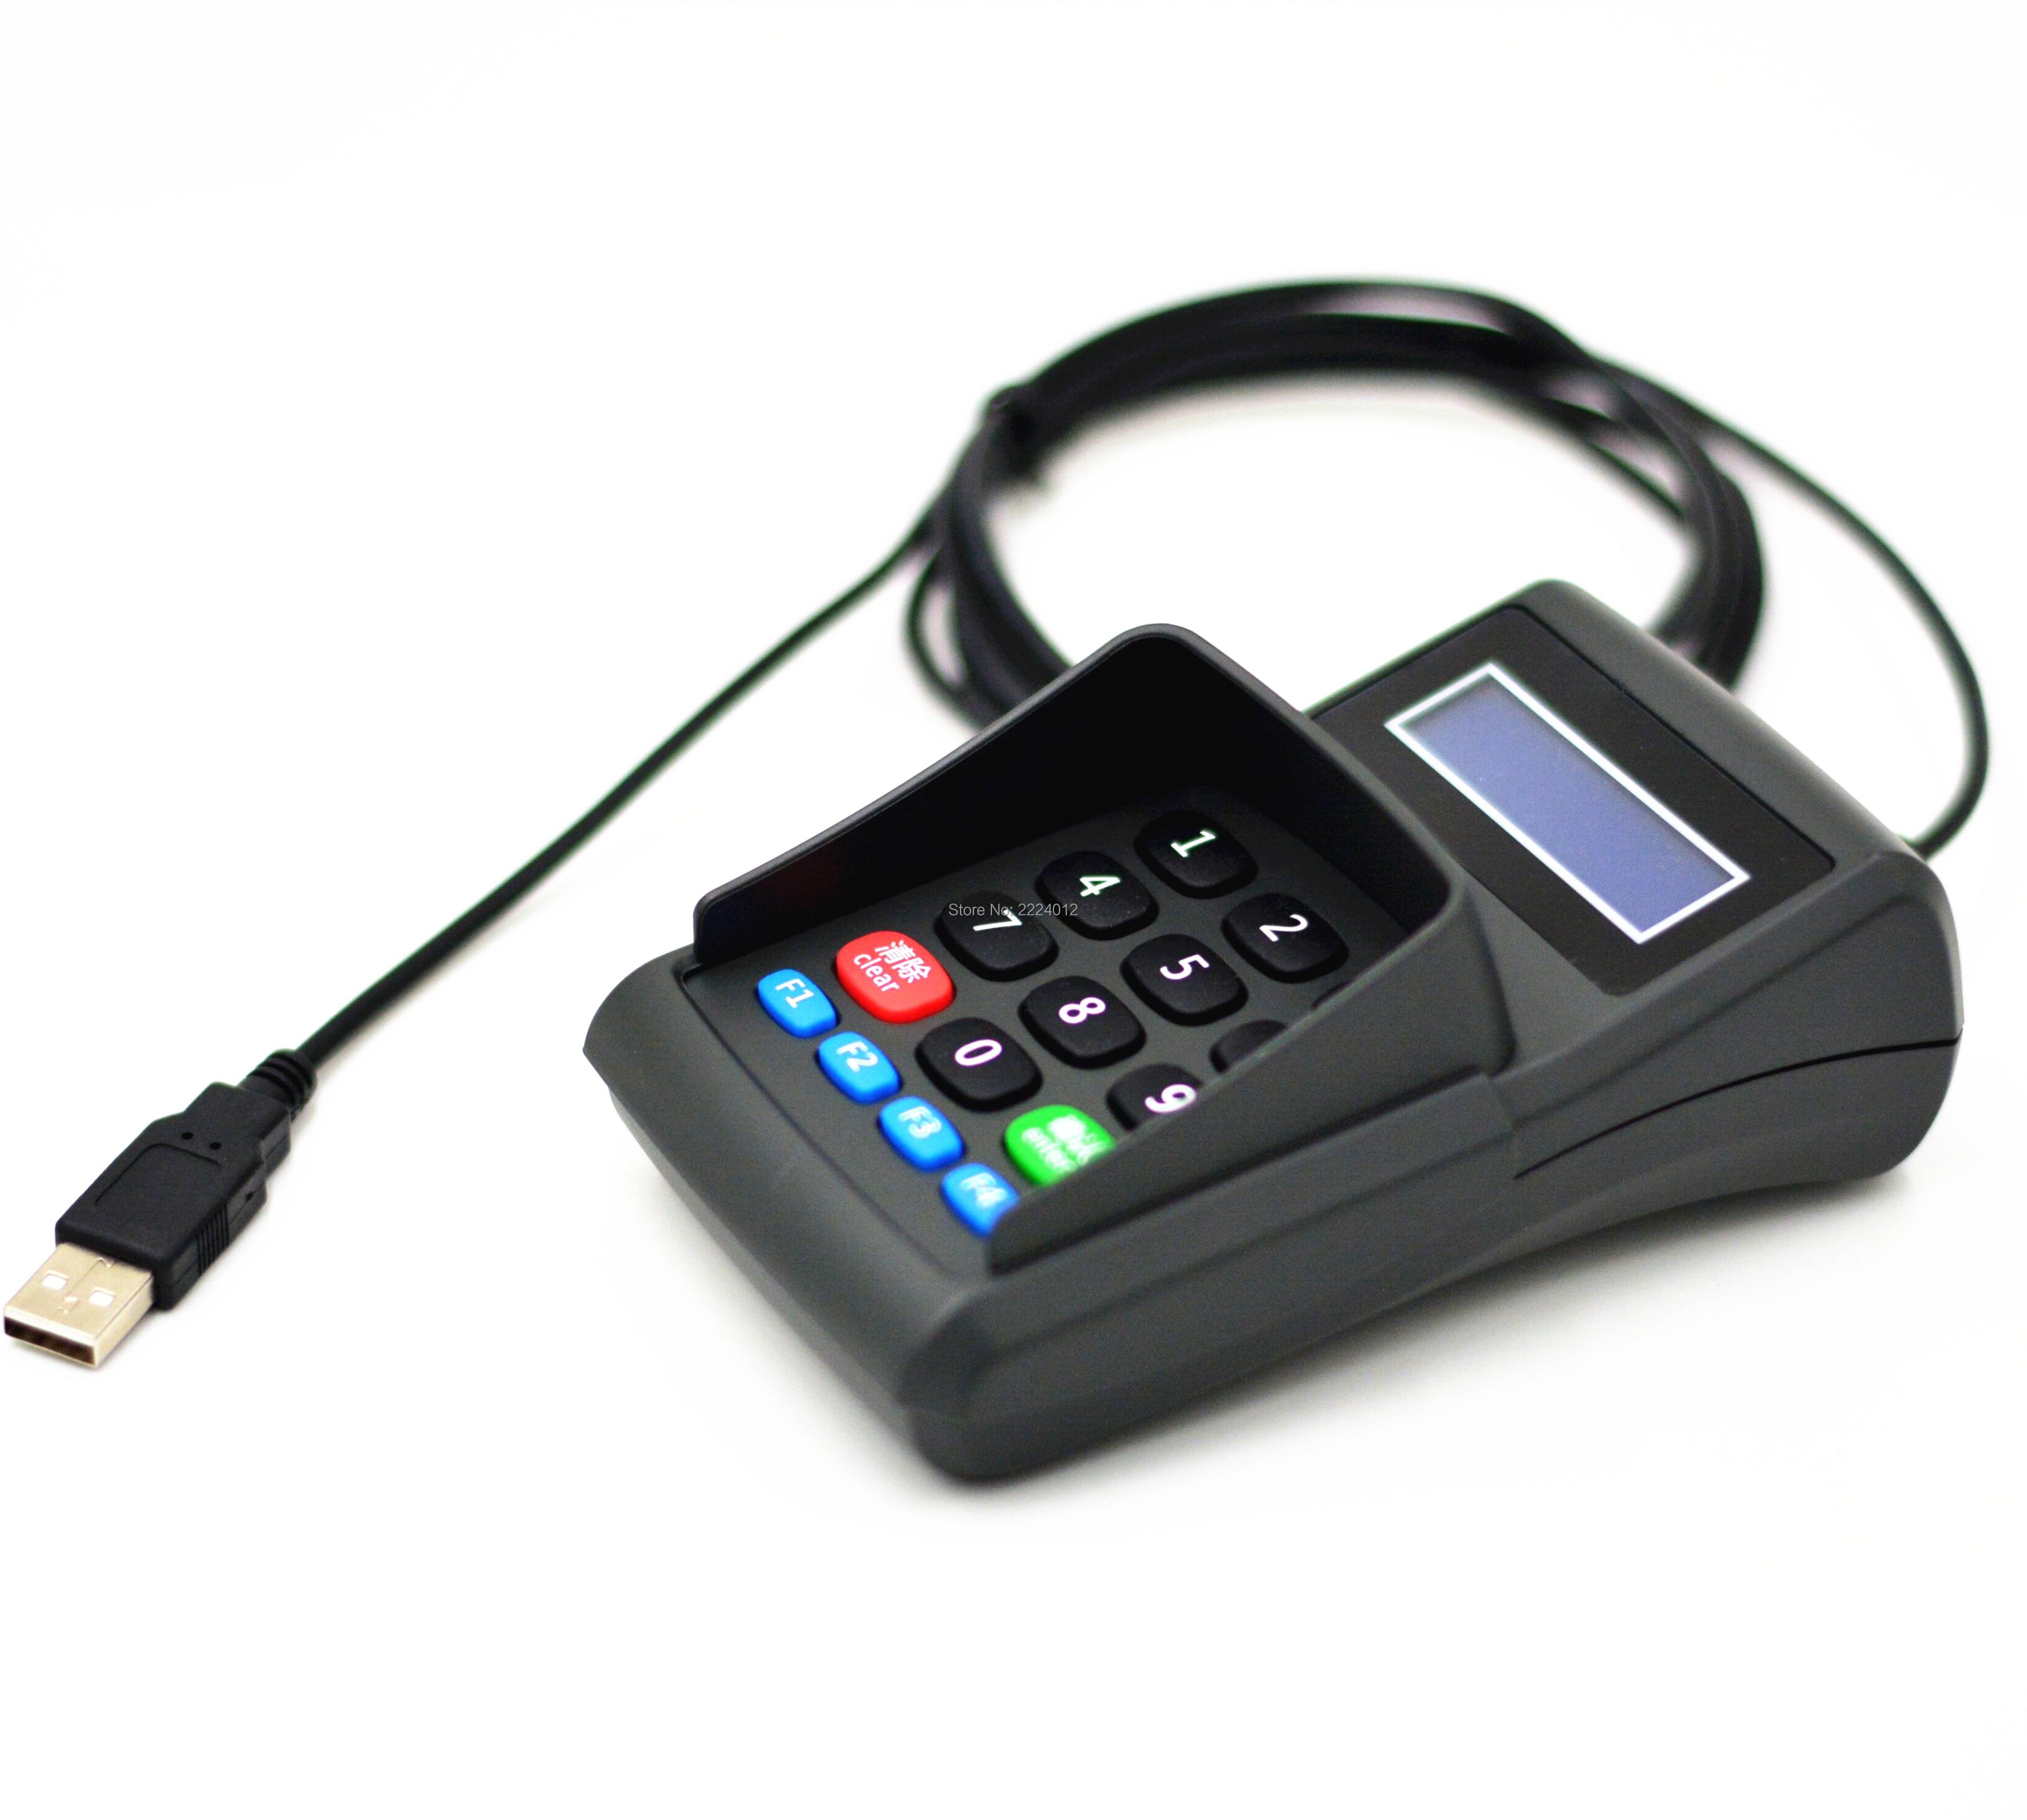 USB YD500B Numeric Keyboard Numpad/Digital Keyboard /Pin Pad With LCD For Bank POS EPOS Terminal Equipment Password Input